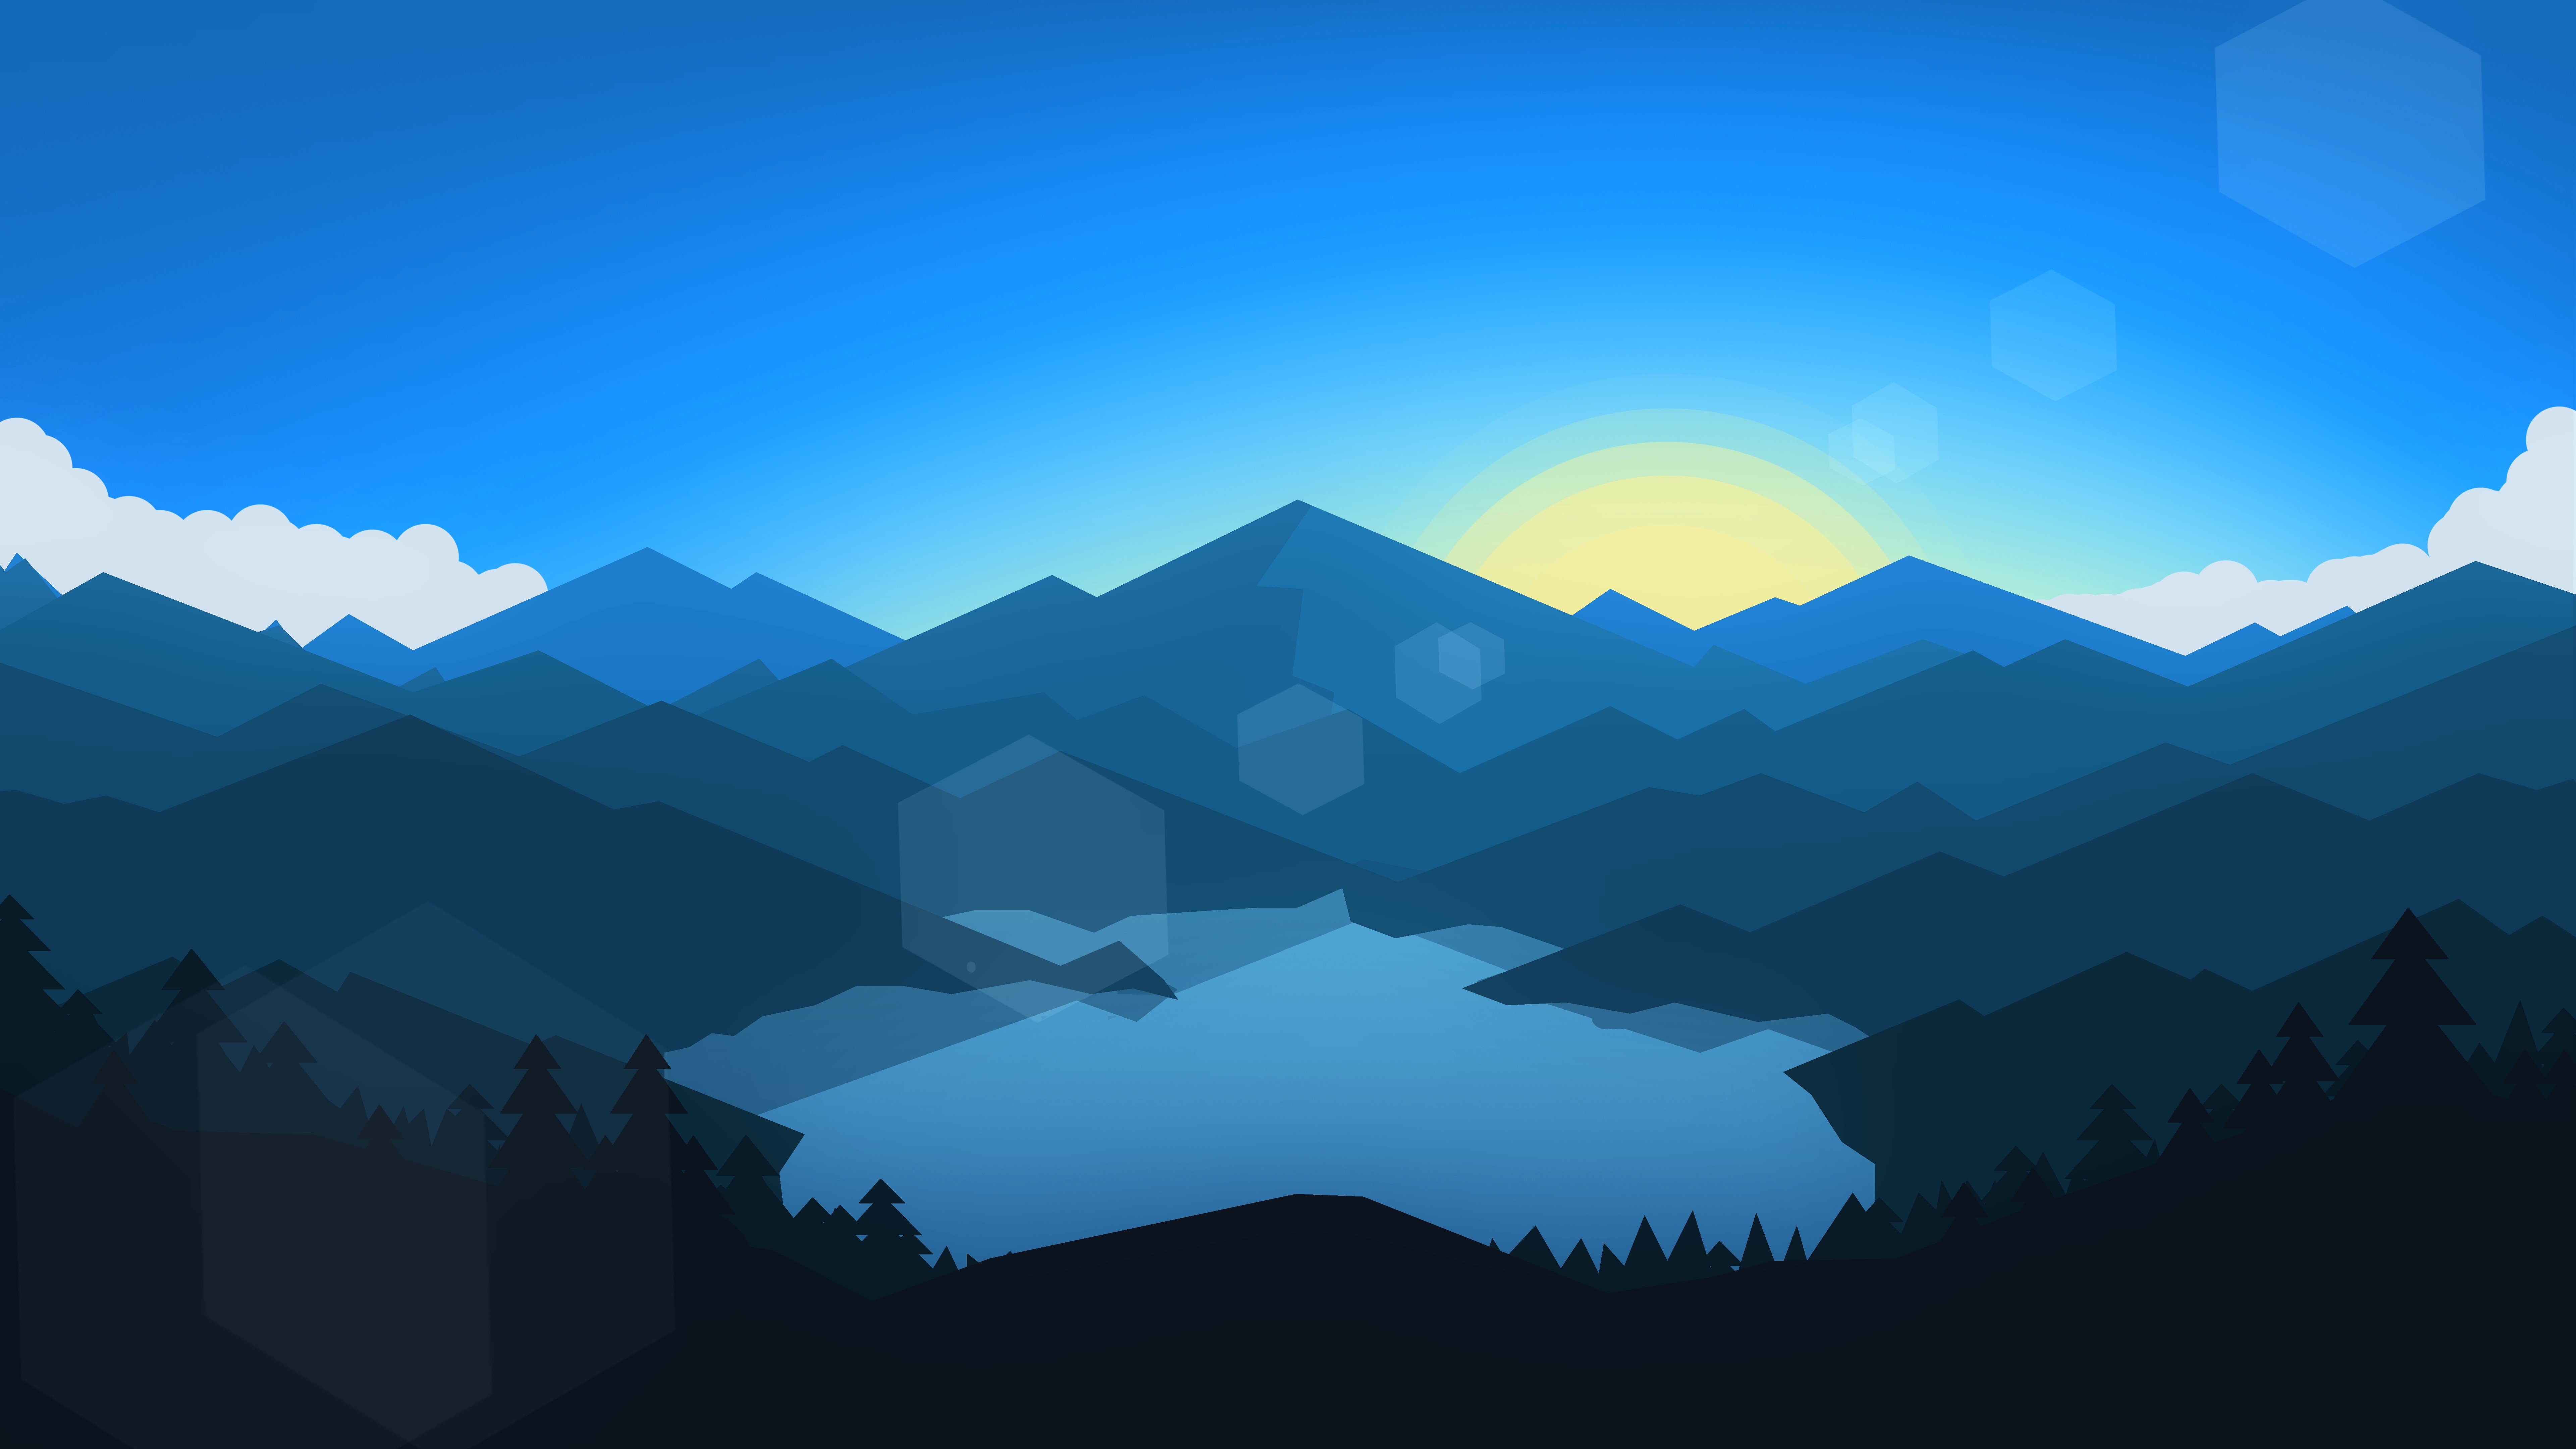 Forest mountains sunset cool weather minimalism hd 8k - 8k minimal wallpaper ...